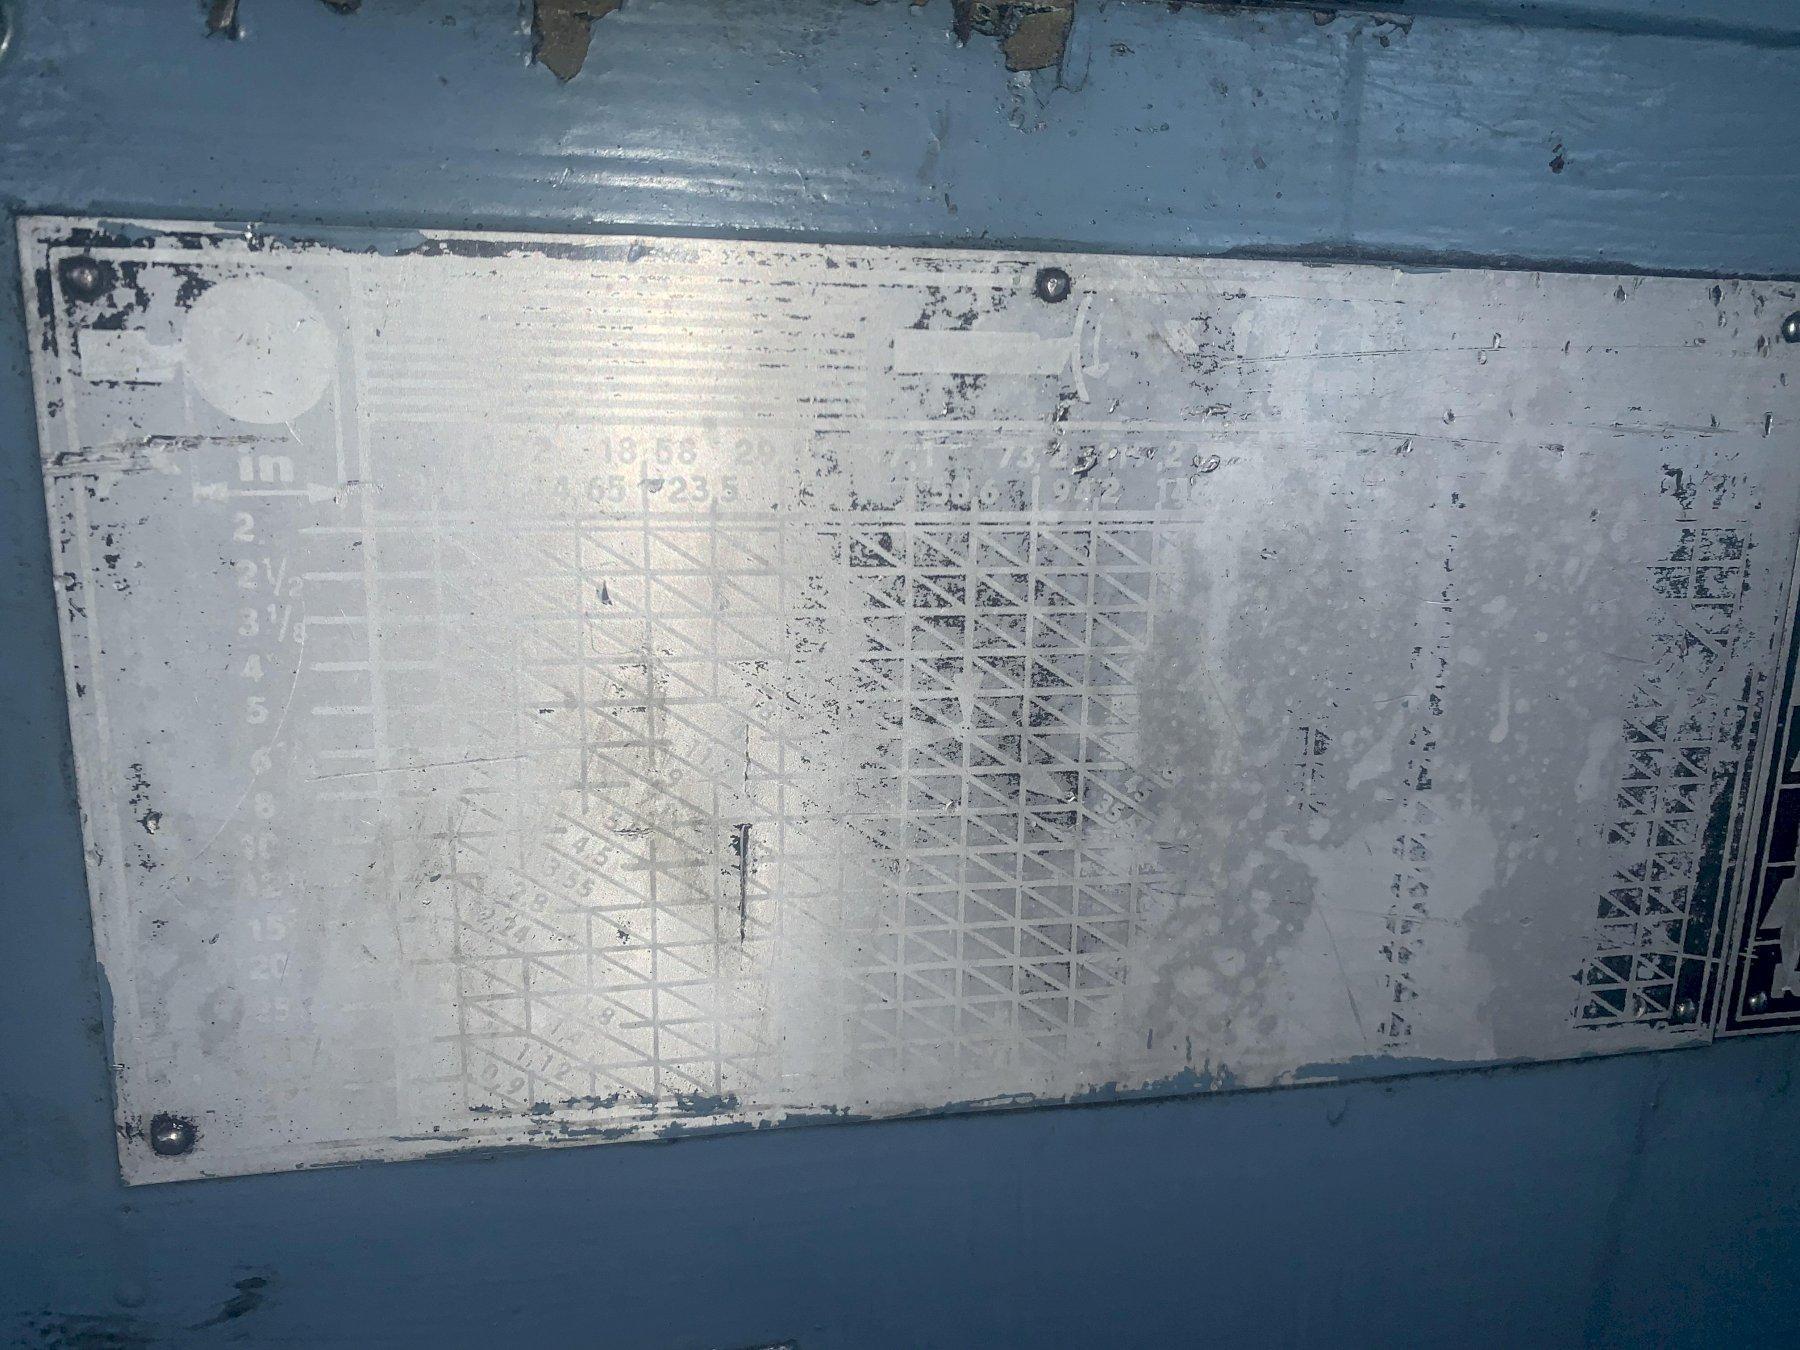 "42"" X 240"" TOS MODEL SU100 HEAVY DUTY ENGINE LATHE"